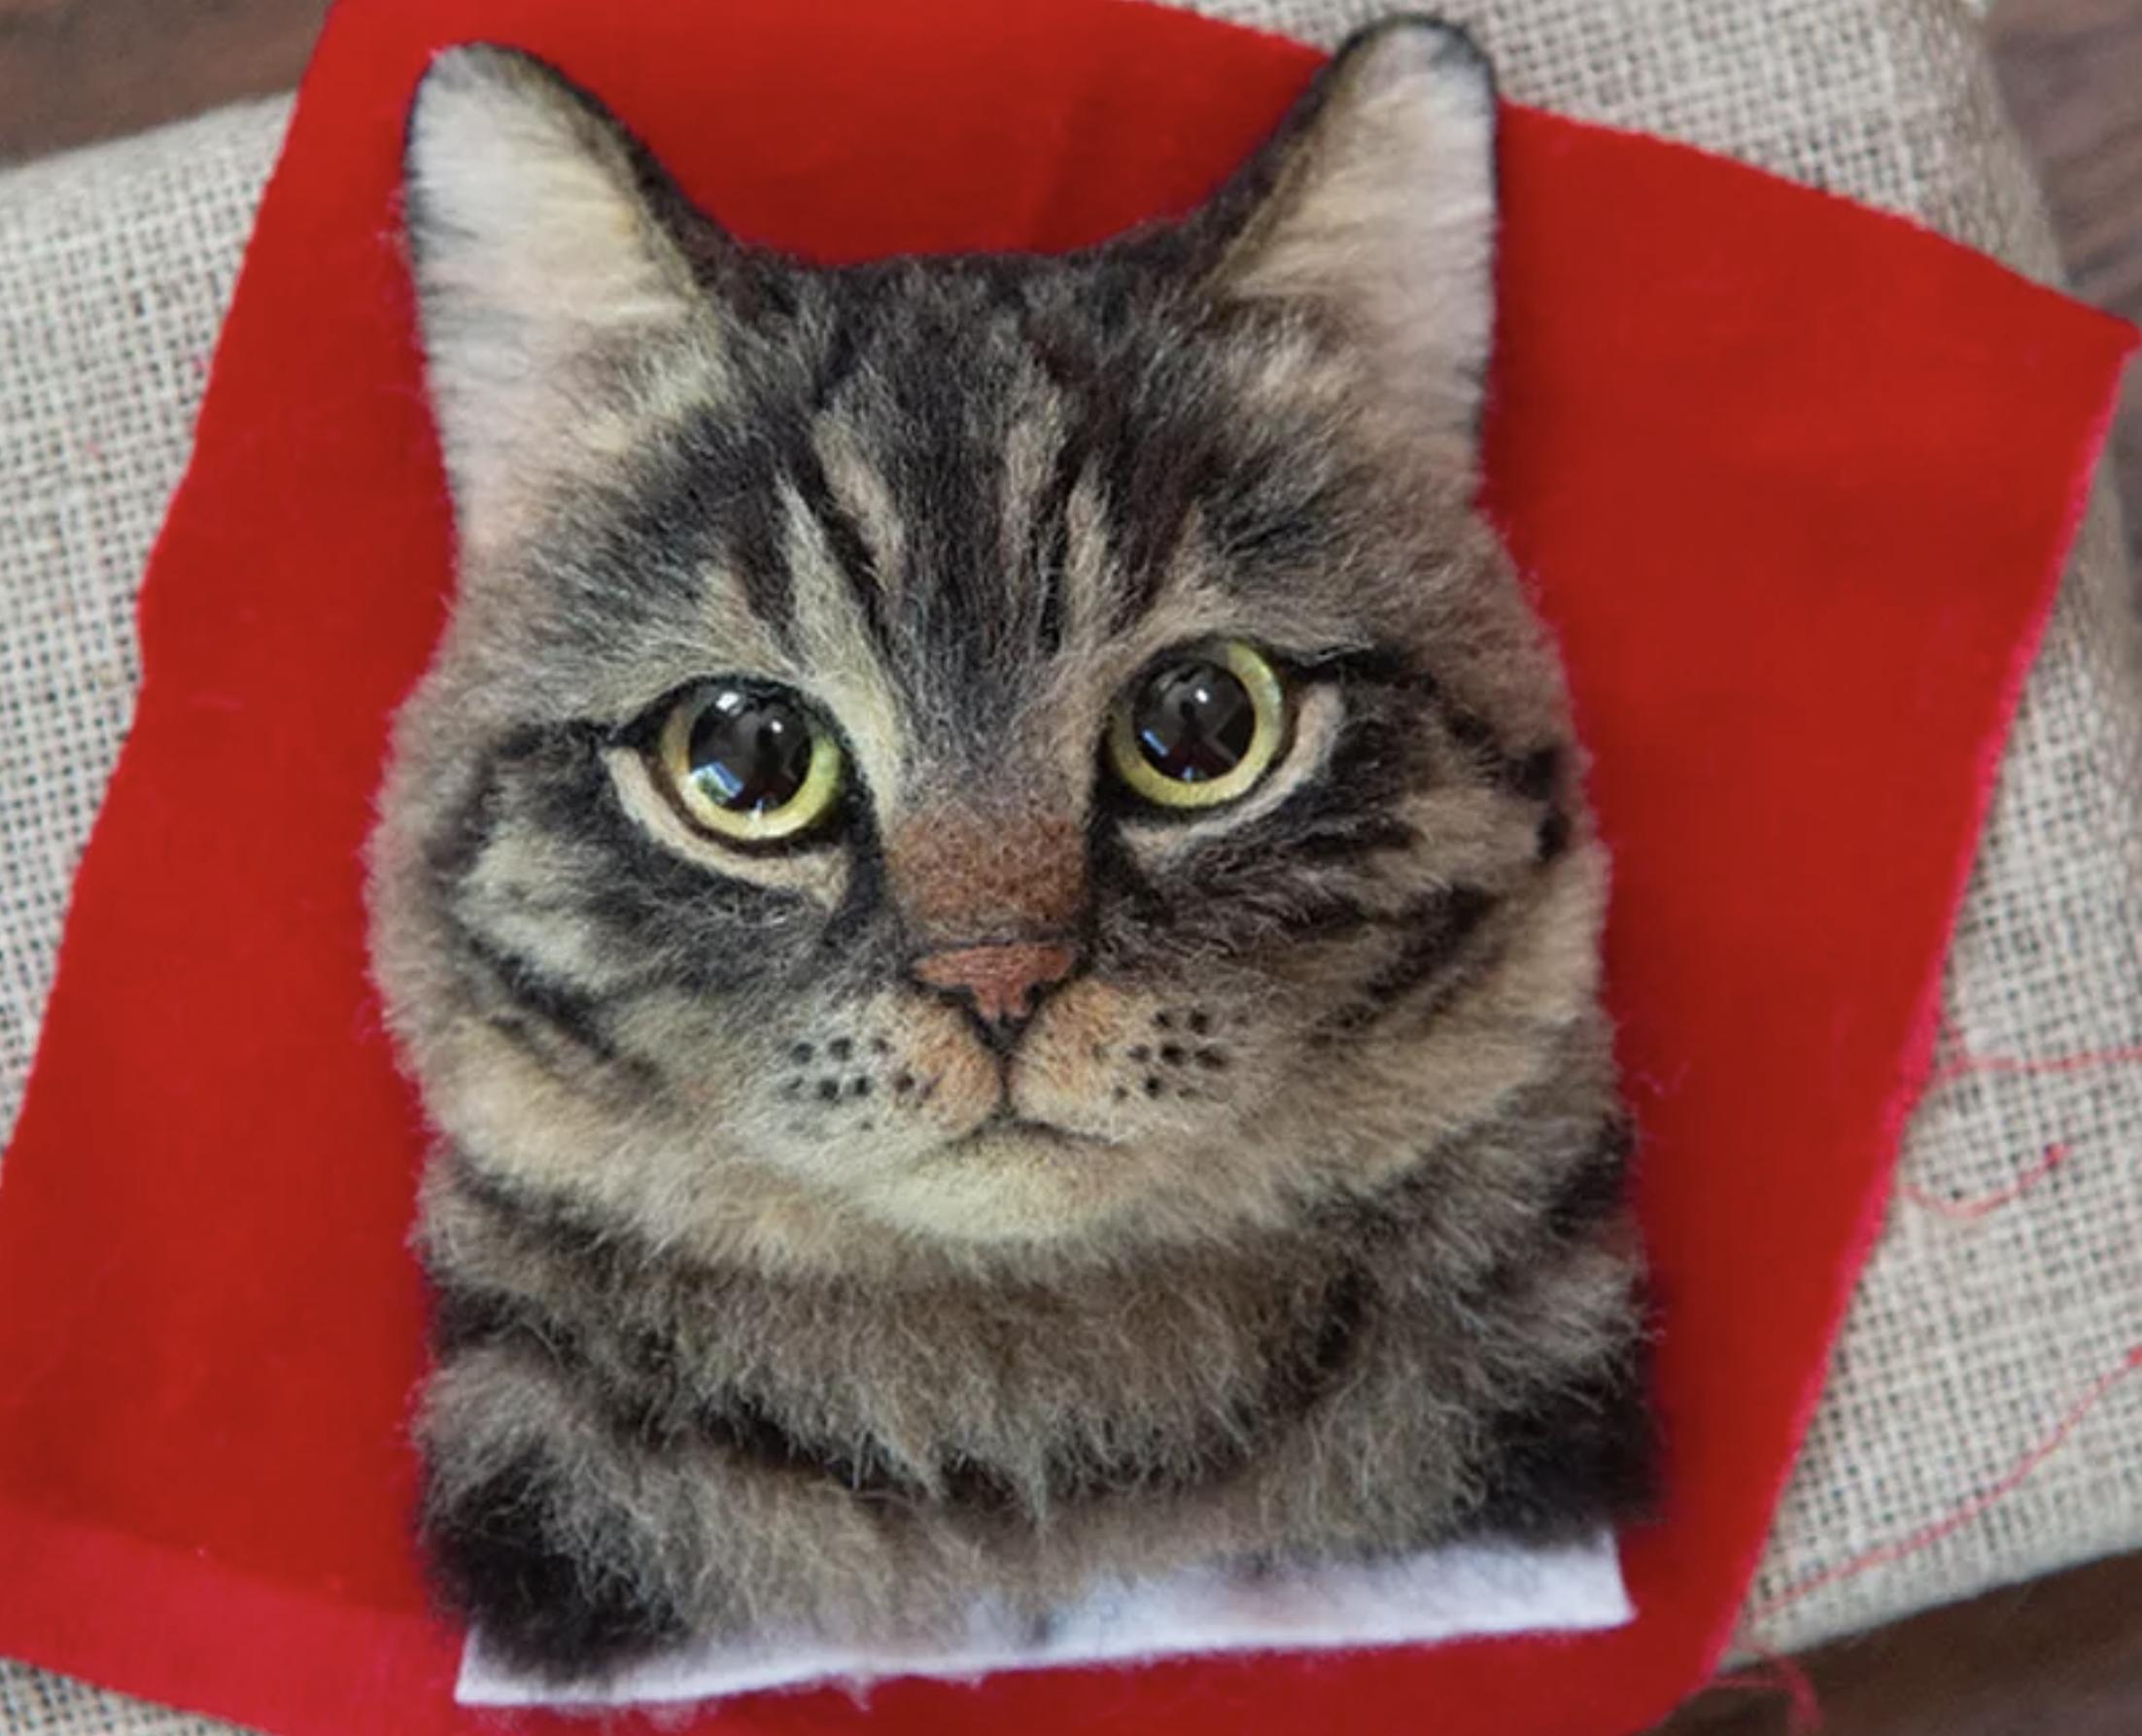 Caturday felid trifecta: Japanese felt cat artist